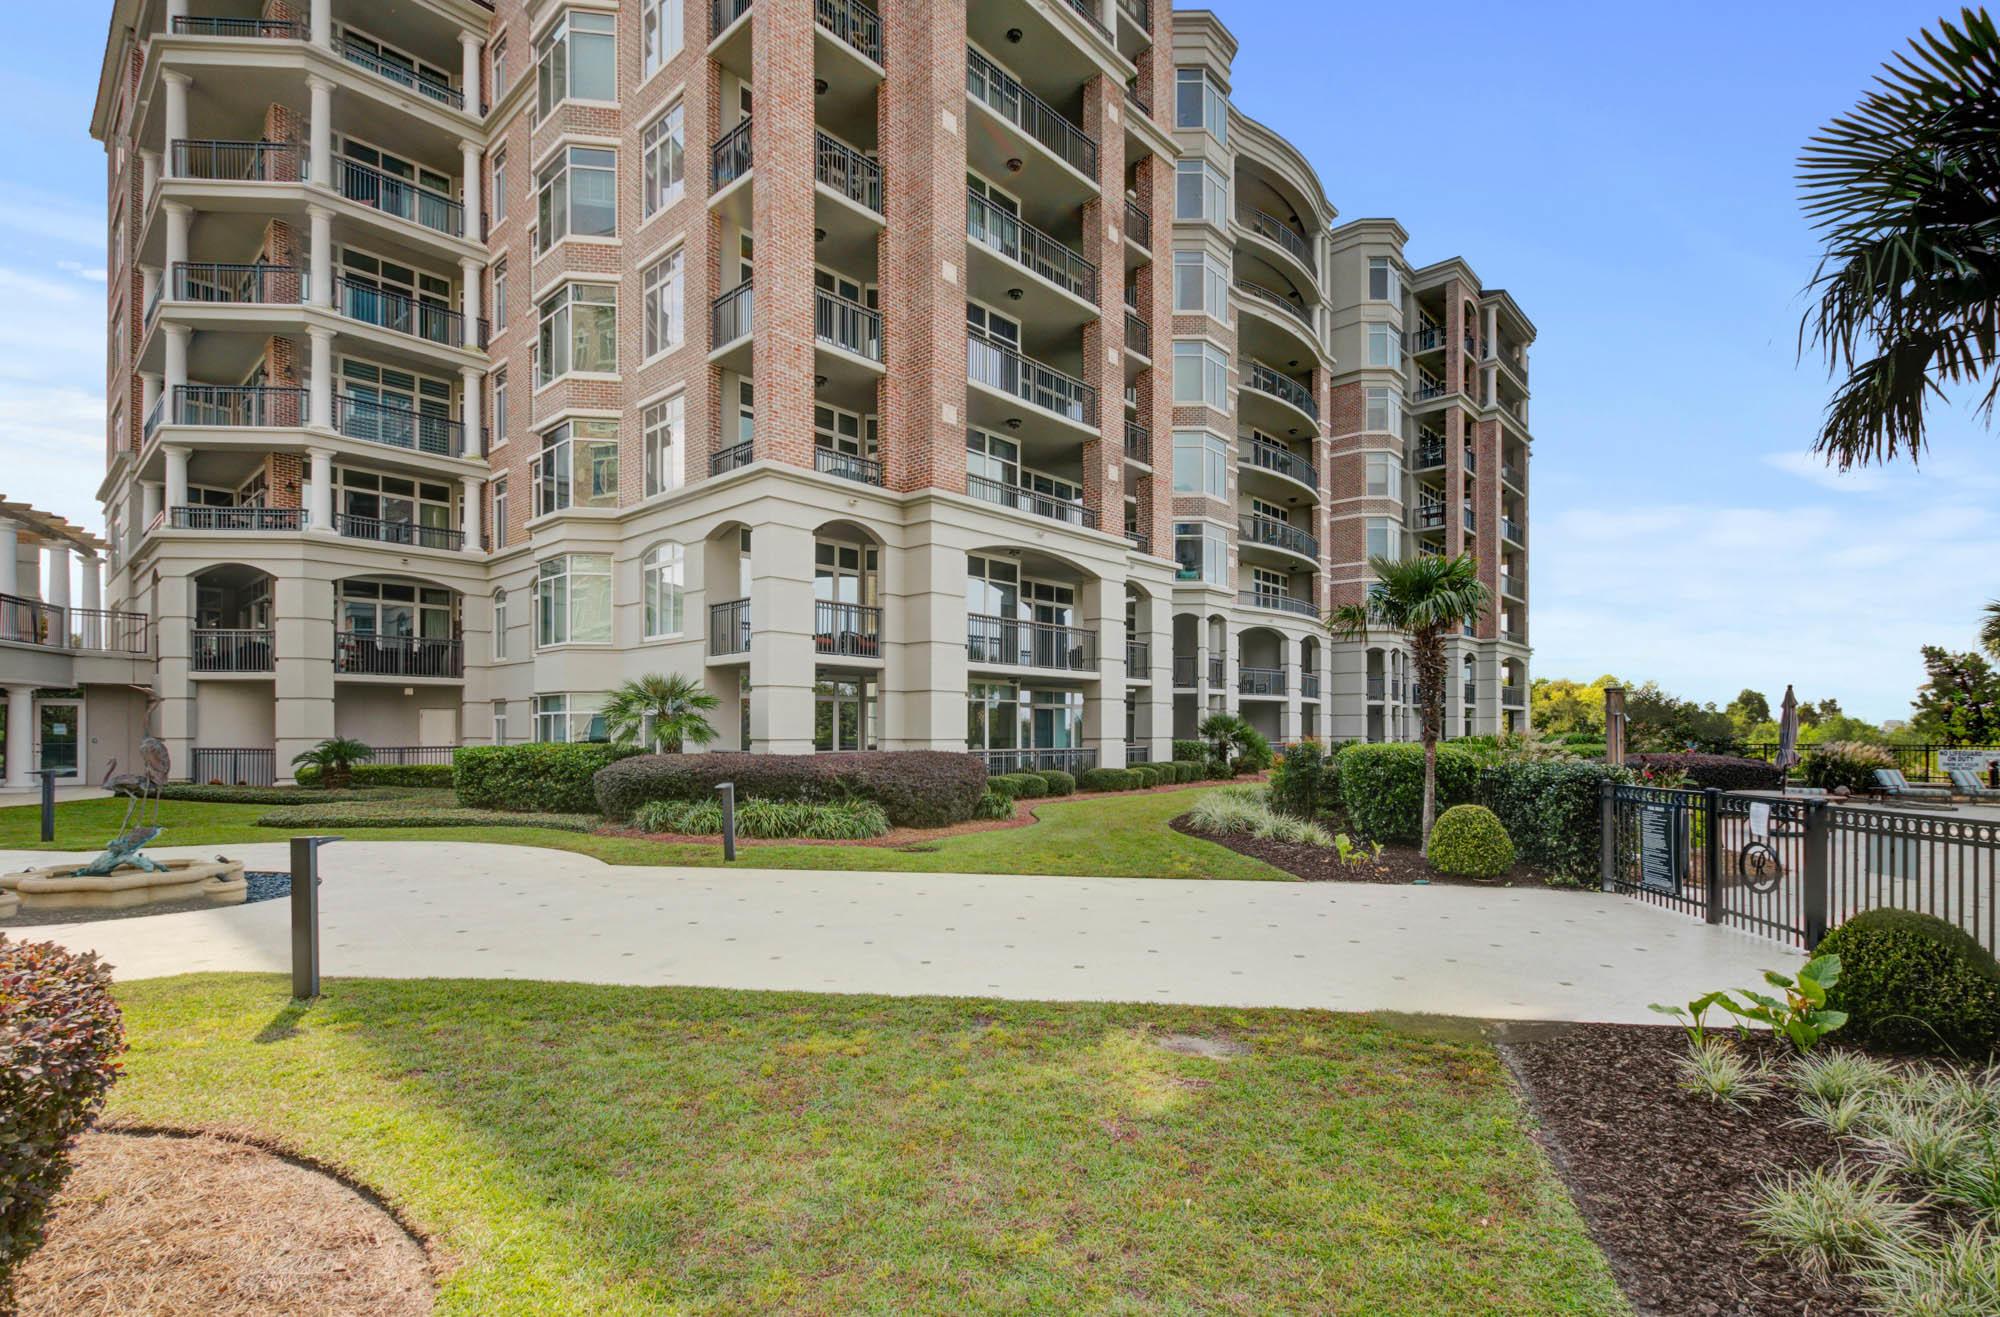 Renaissance On Chas Harbor Homes For Sale - 125 Plaza, Mount Pleasant, SC - 19